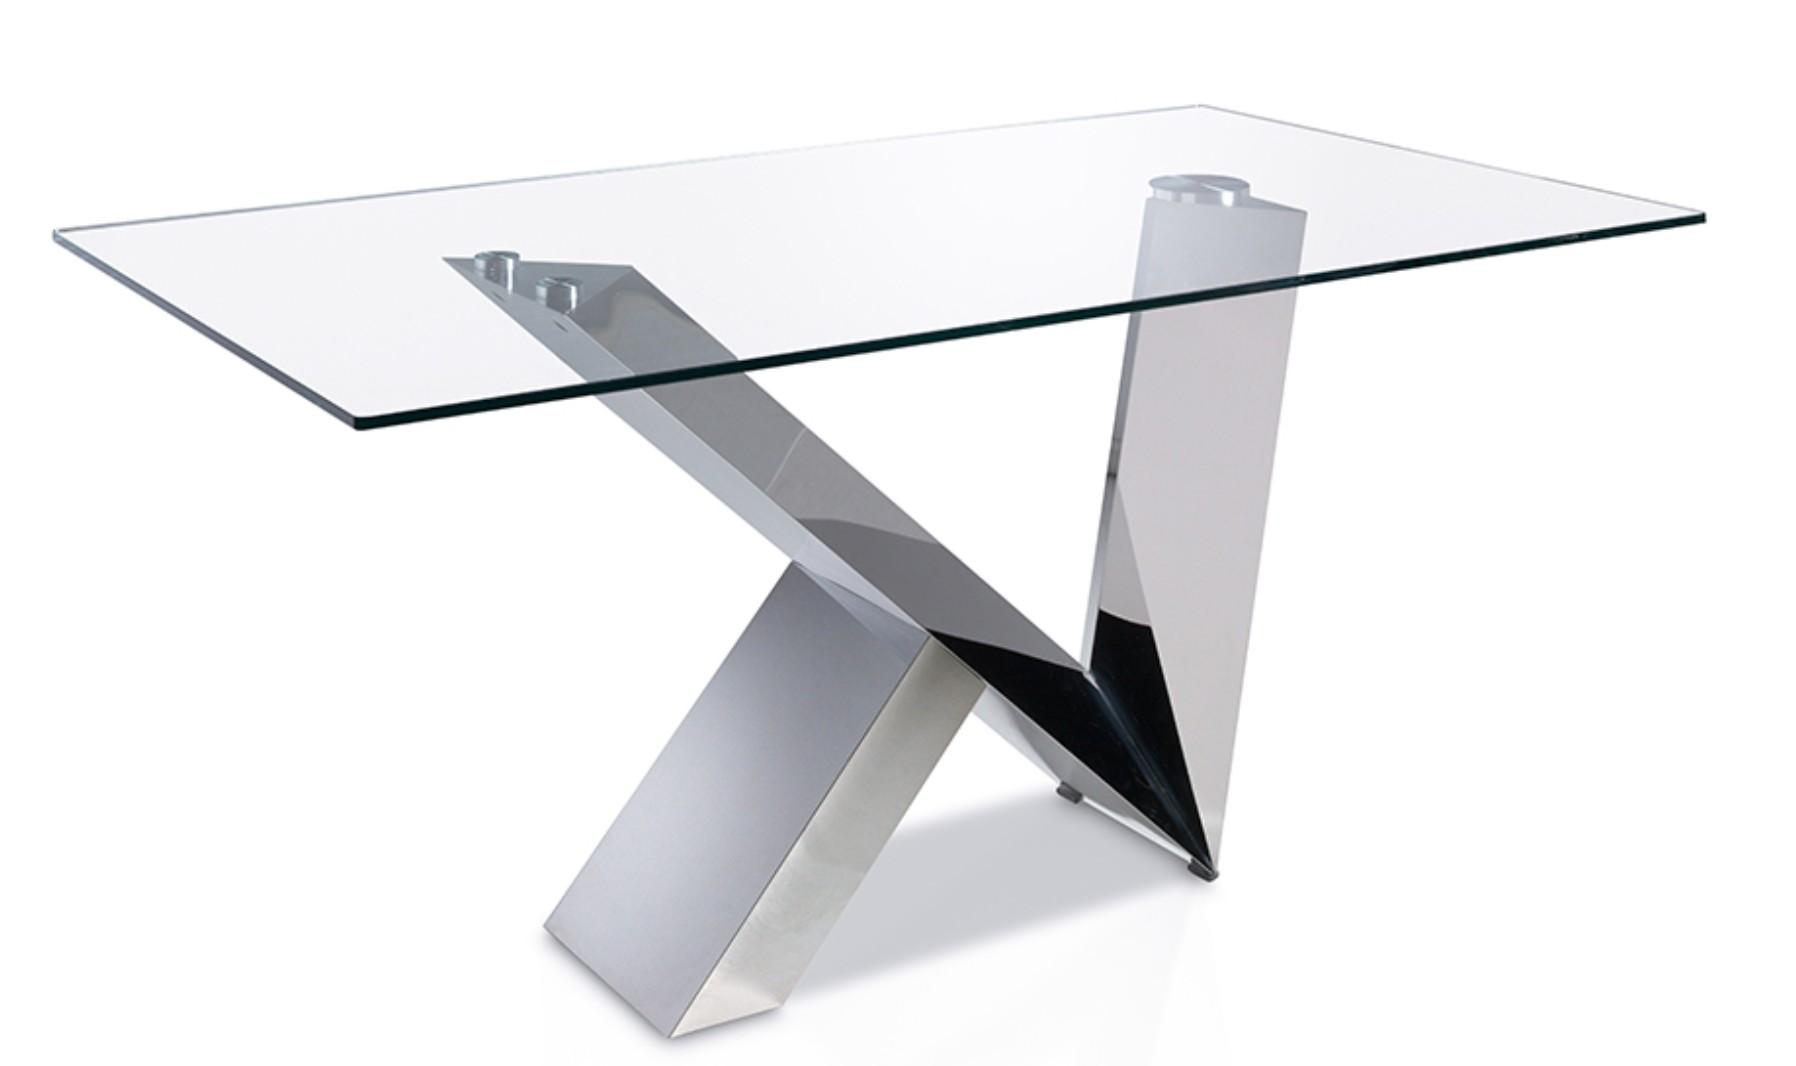 table rectangulaire acier inoxydable et plateau verre tremp futura 180. Black Bedroom Furniture Sets. Home Design Ideas